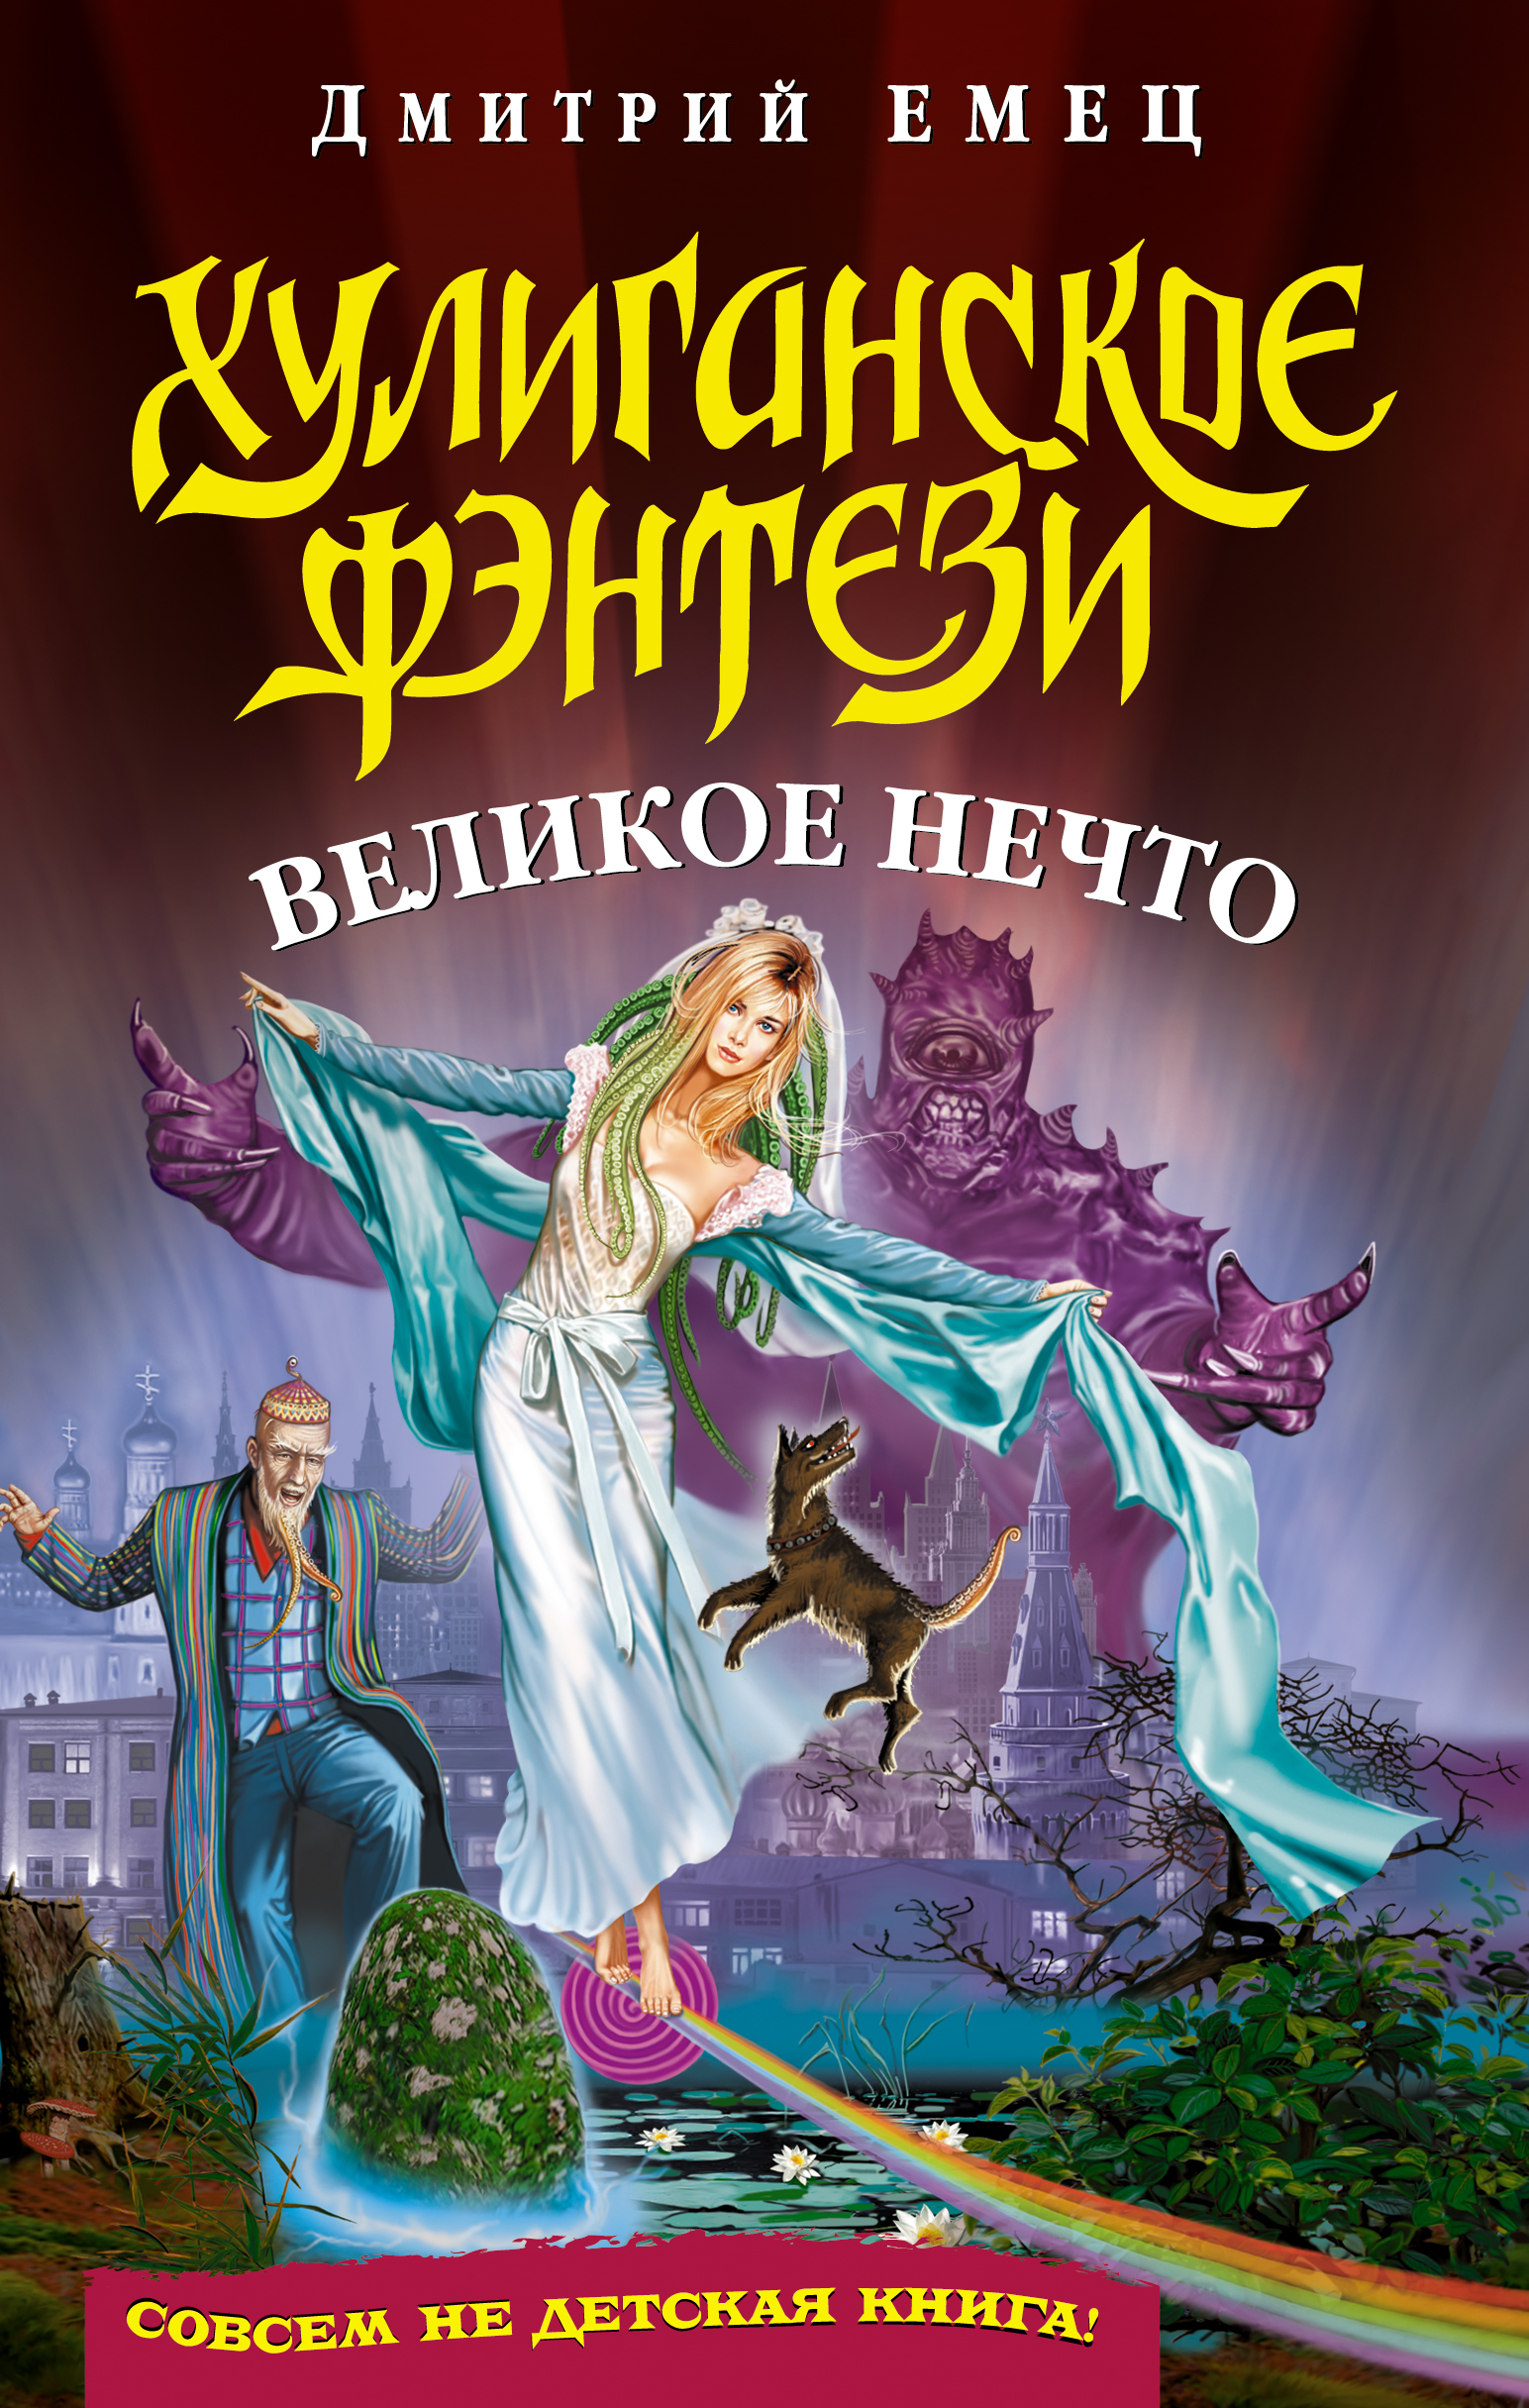 Дмитрий Емец Великое Нечто цена и фото